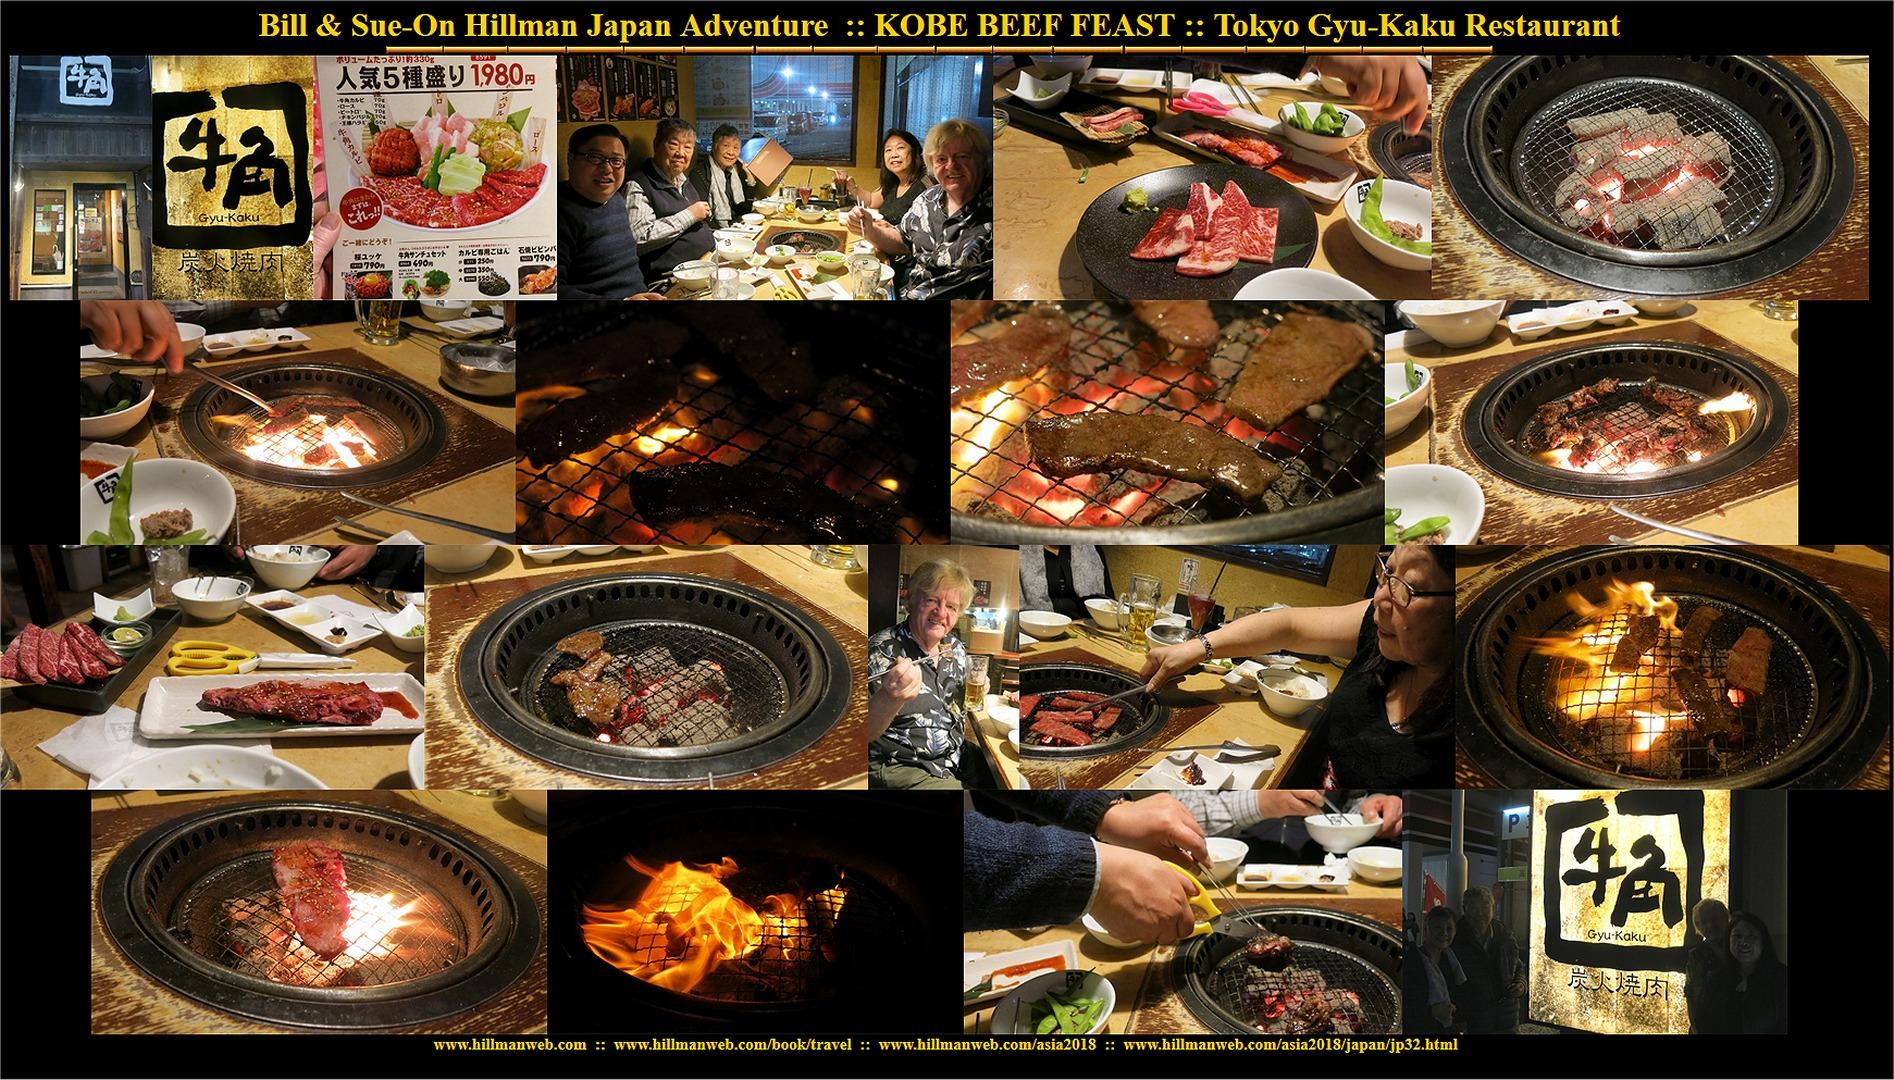 35:6: Last Supper